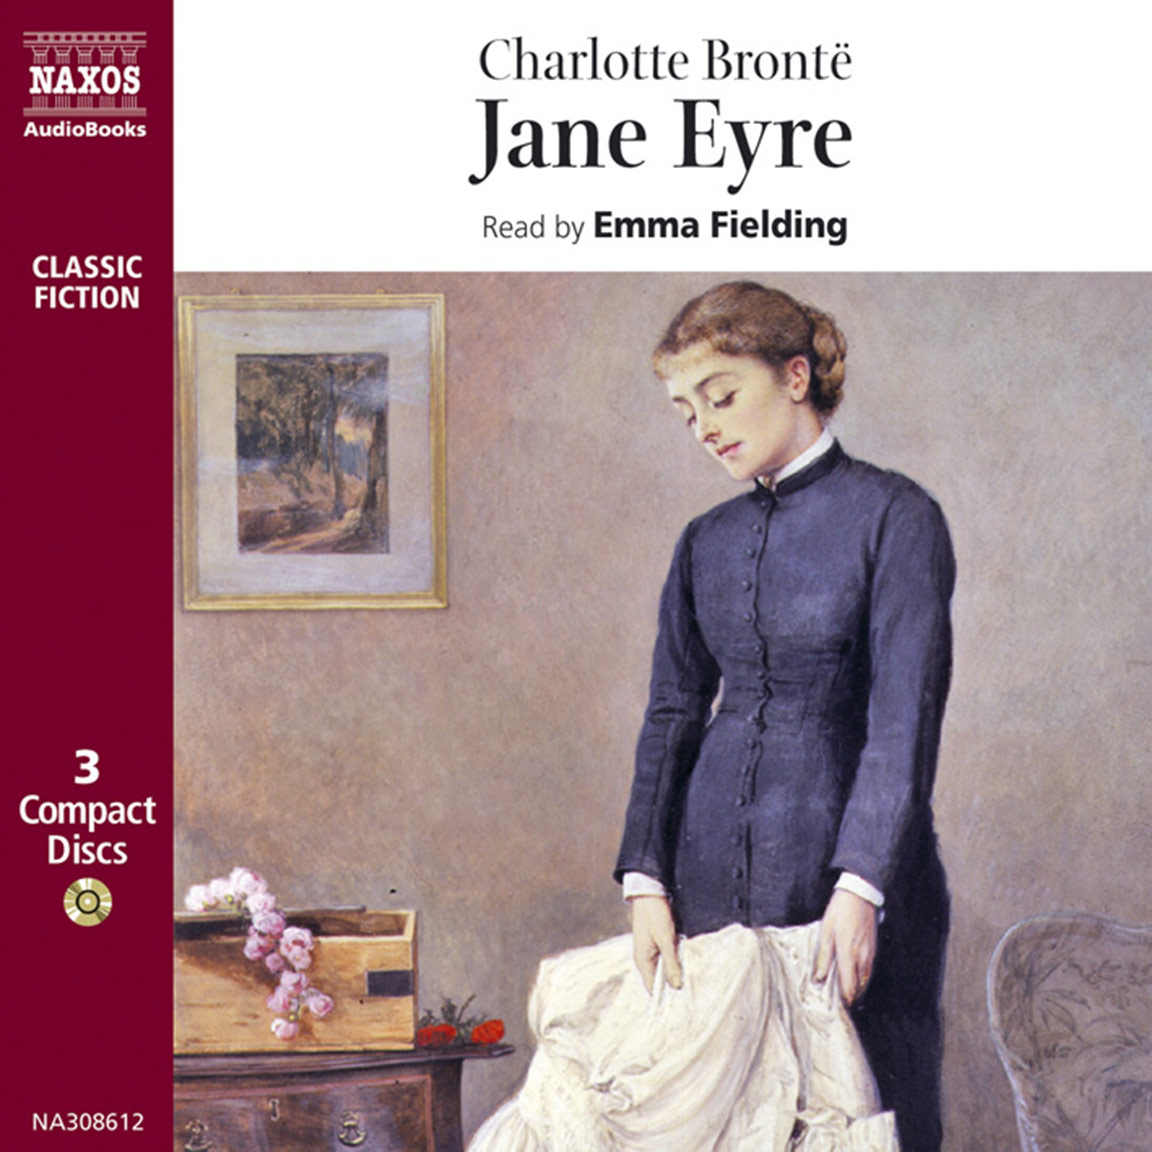 Jane Eyre (abridged)